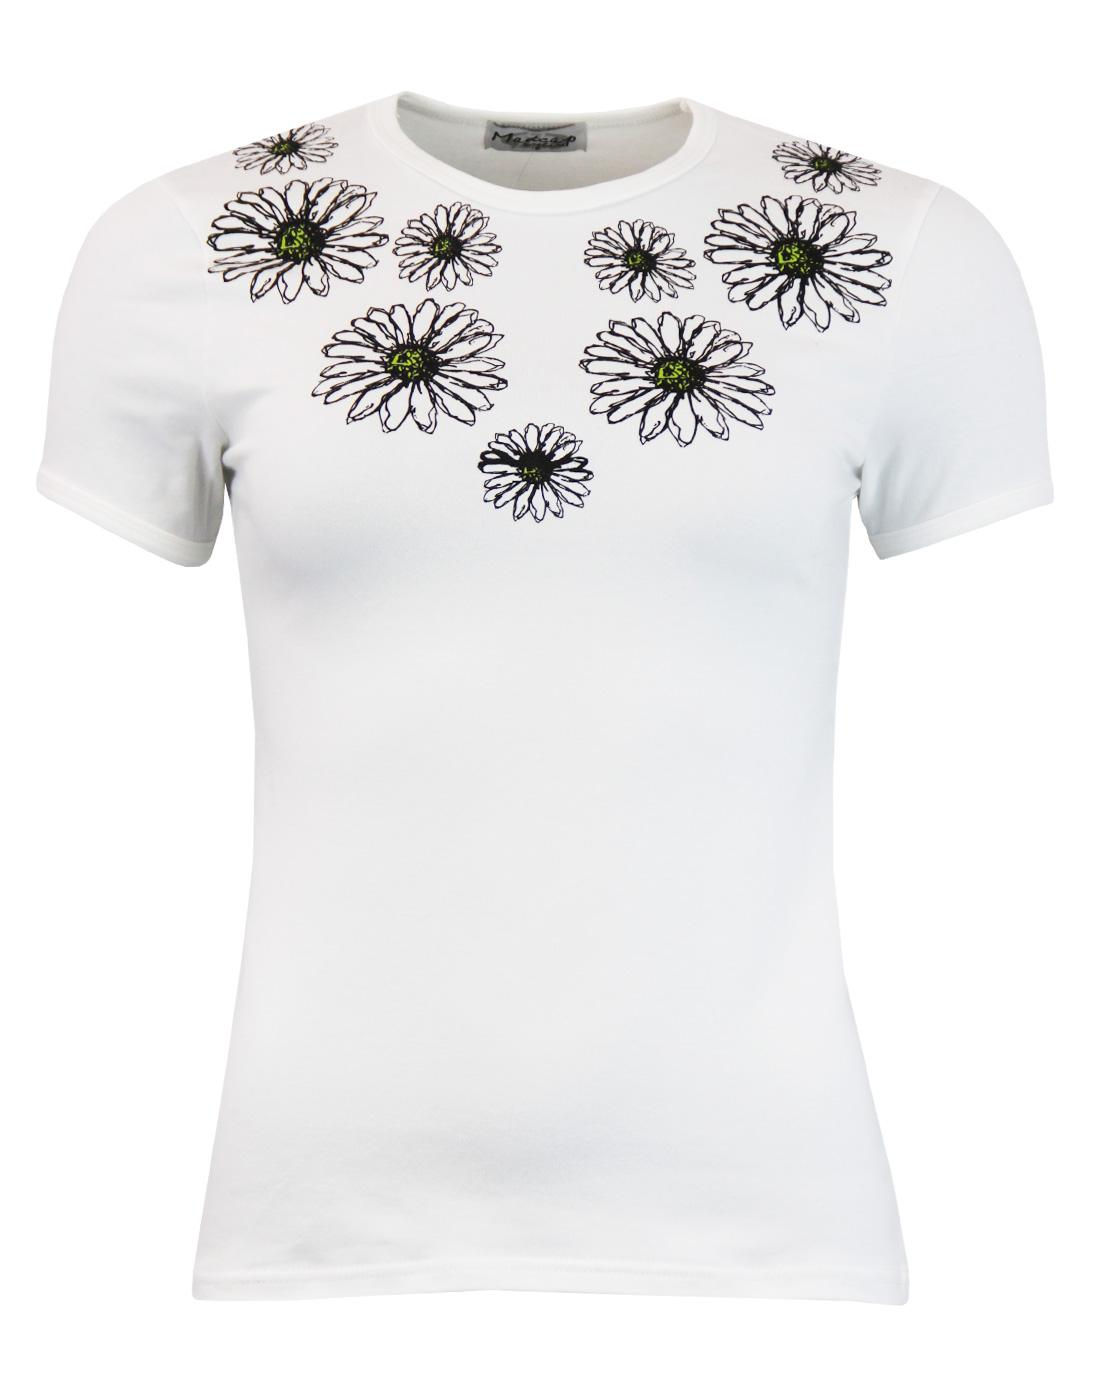 Daisy MADCAP ENGLAND Hand-Drawn Graphic T-shirt